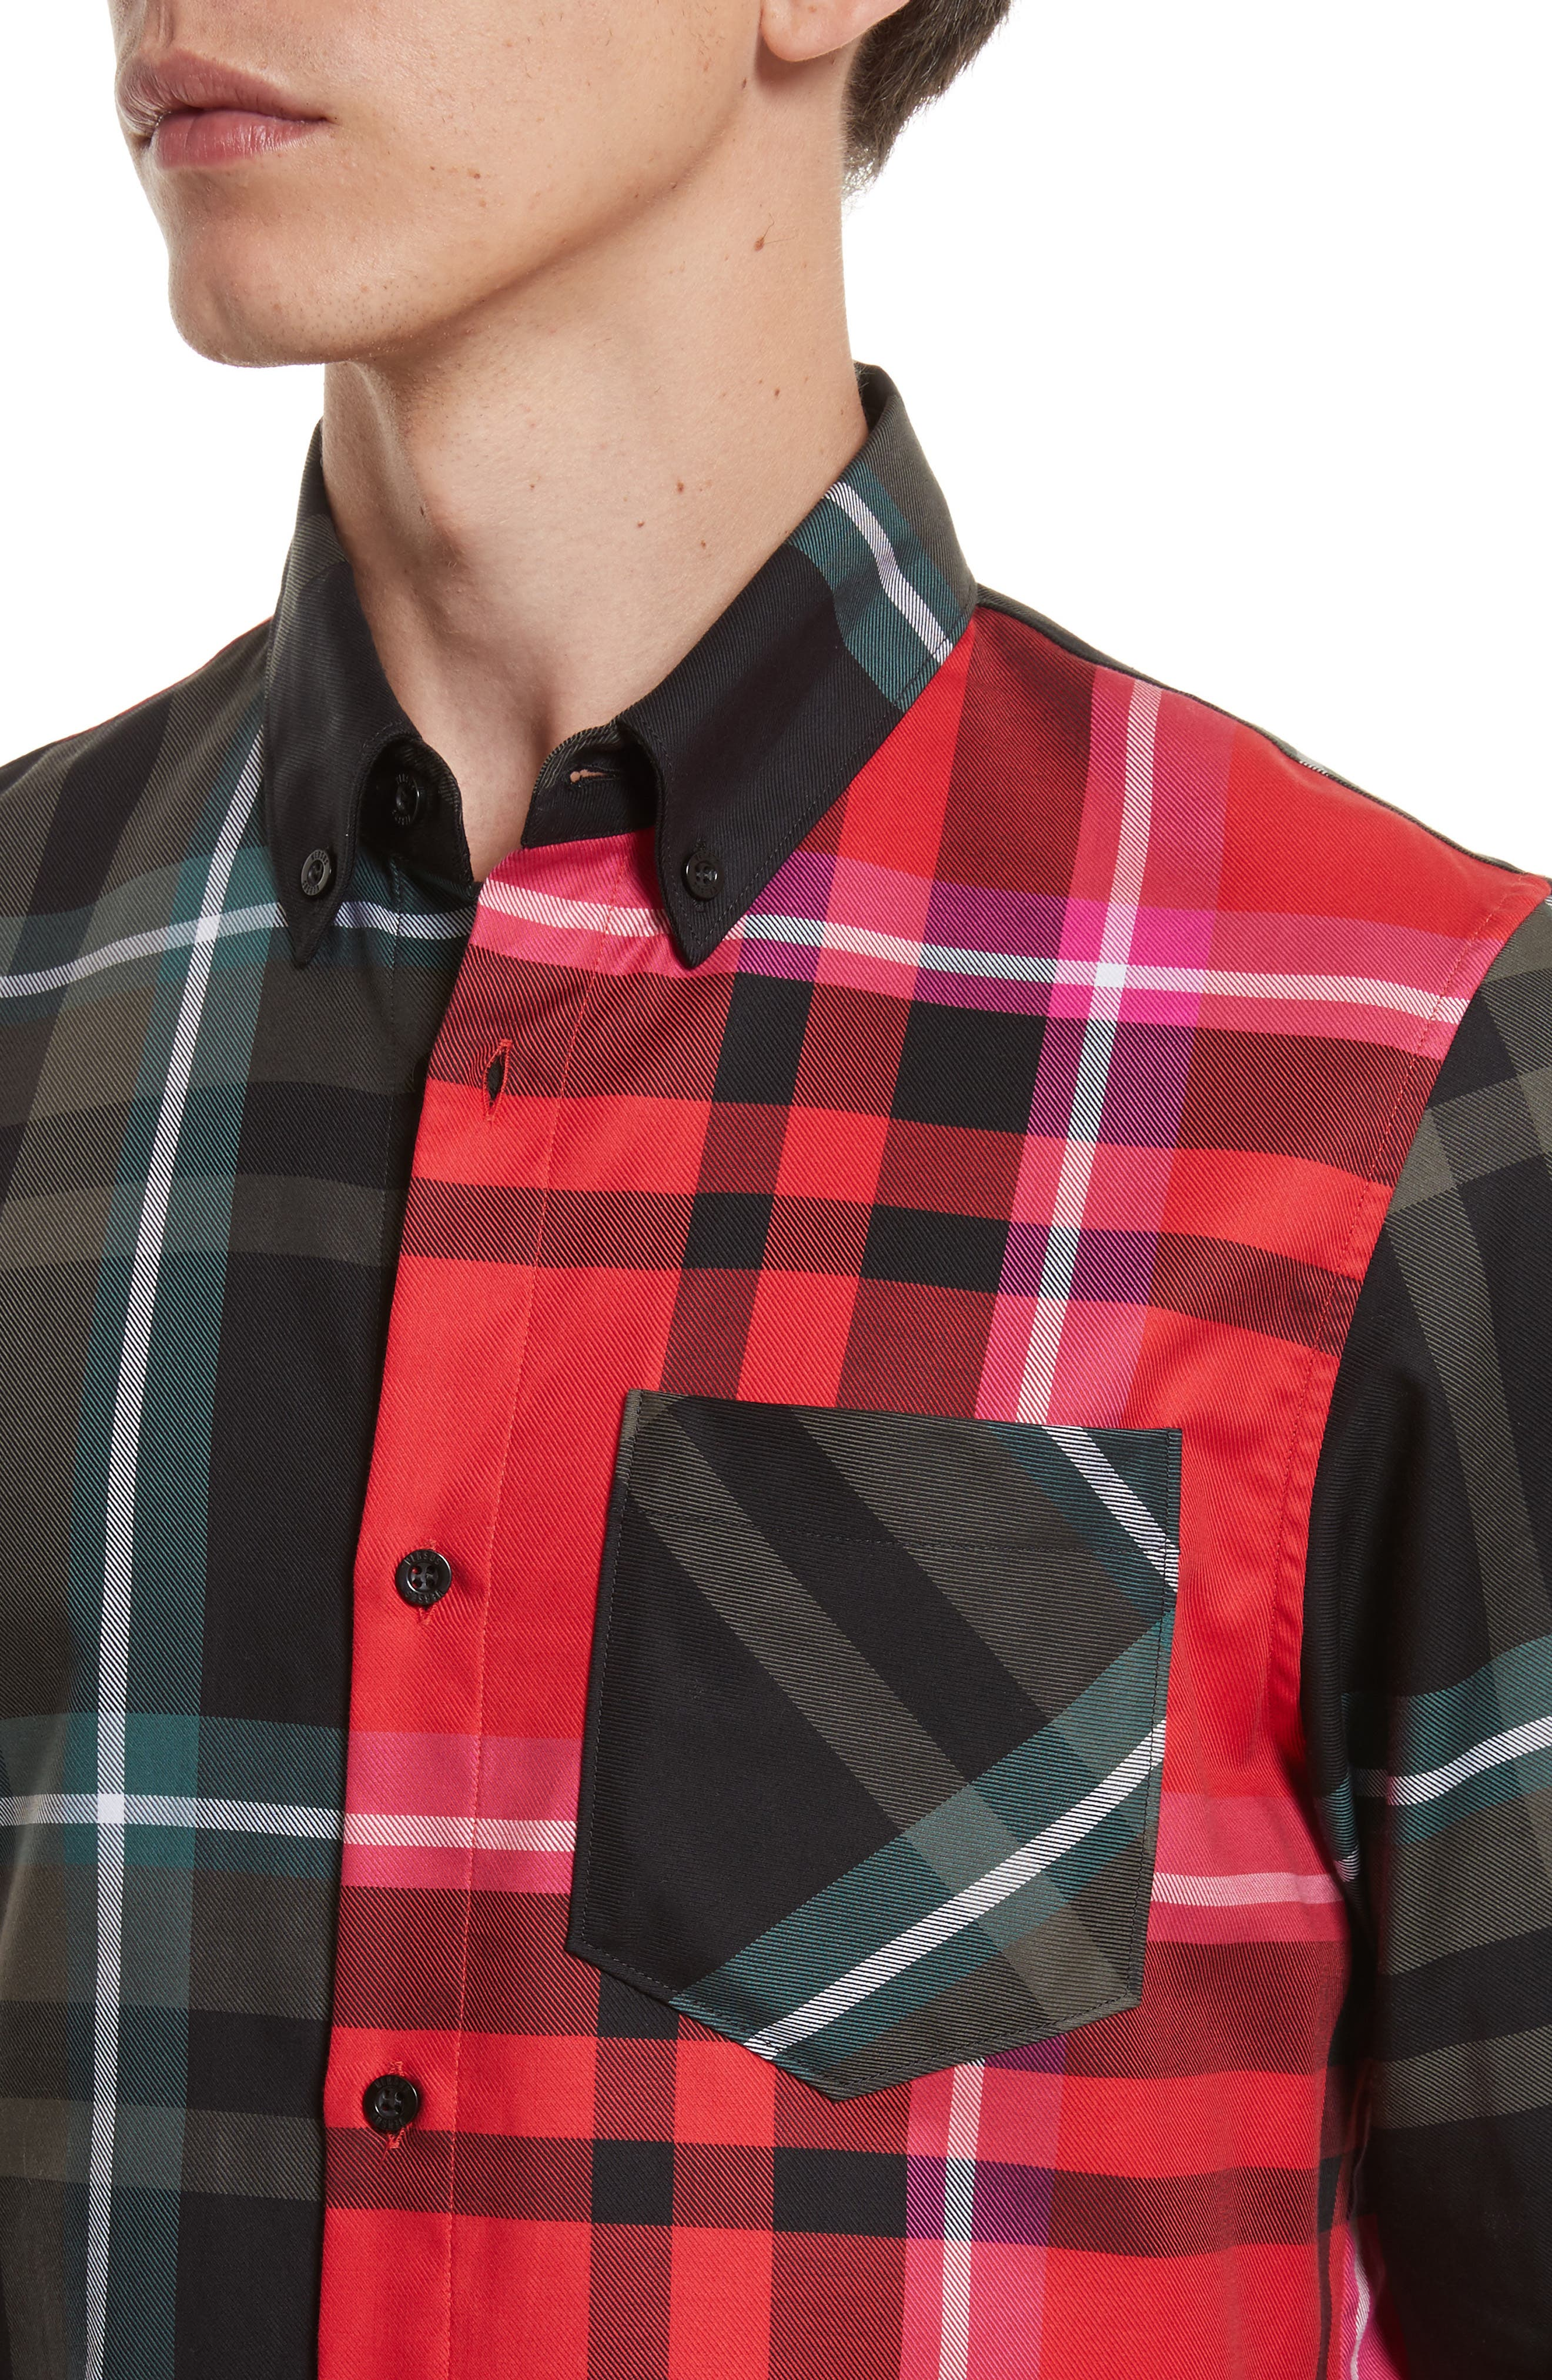 VERSUS by Versace Plaid Woven Shirt,                             Alternate thumbnail 4, color,                             647